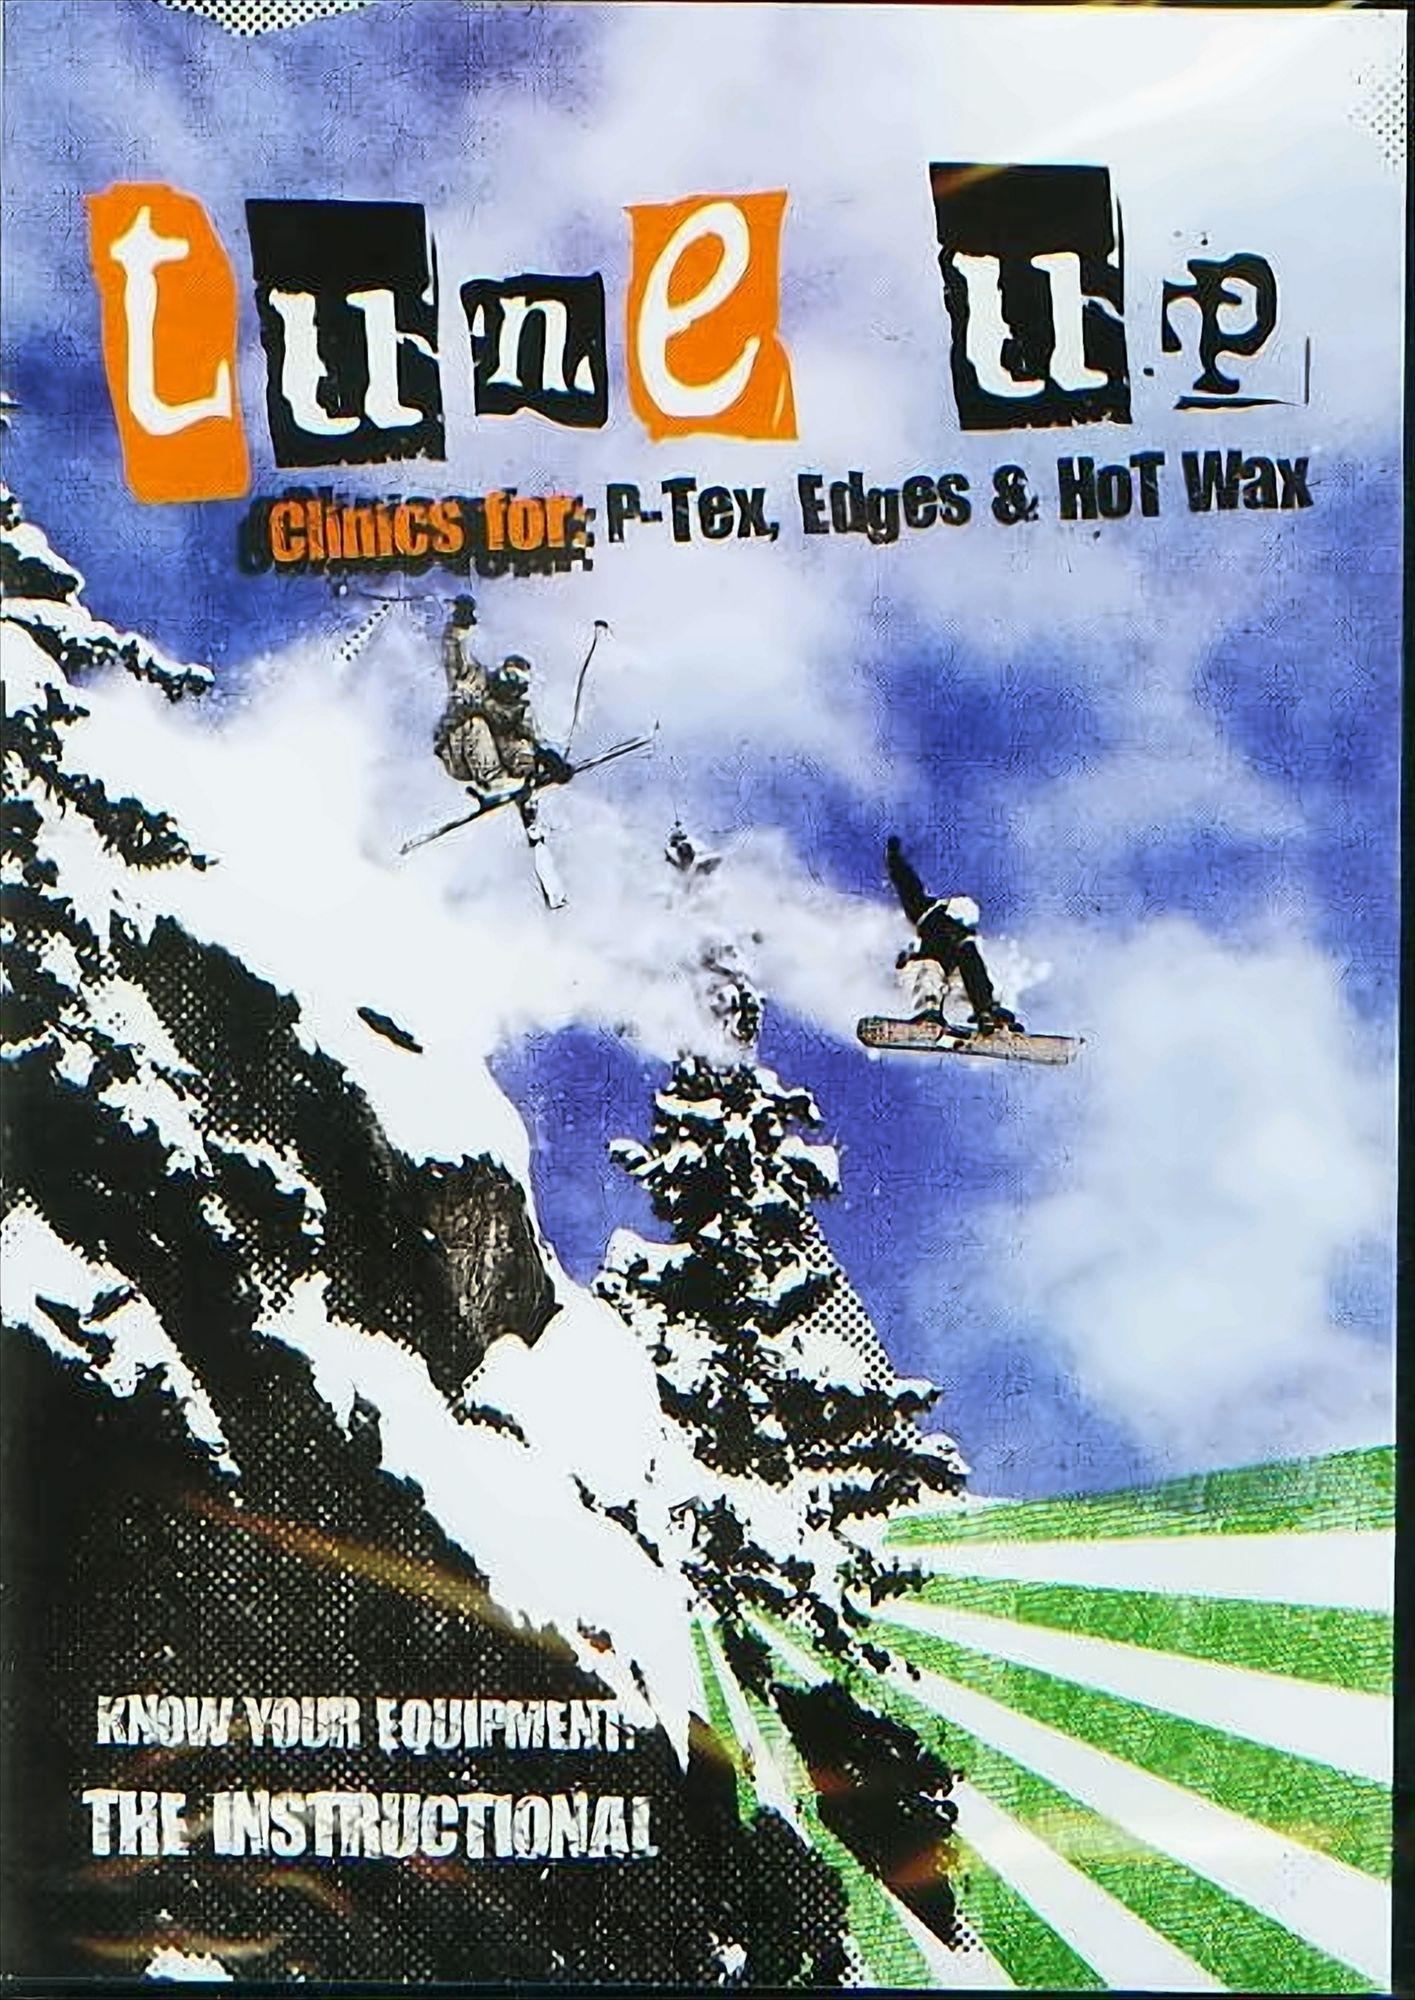 Tune up, Clinics for: P-Tex, Edges + Hot Wax